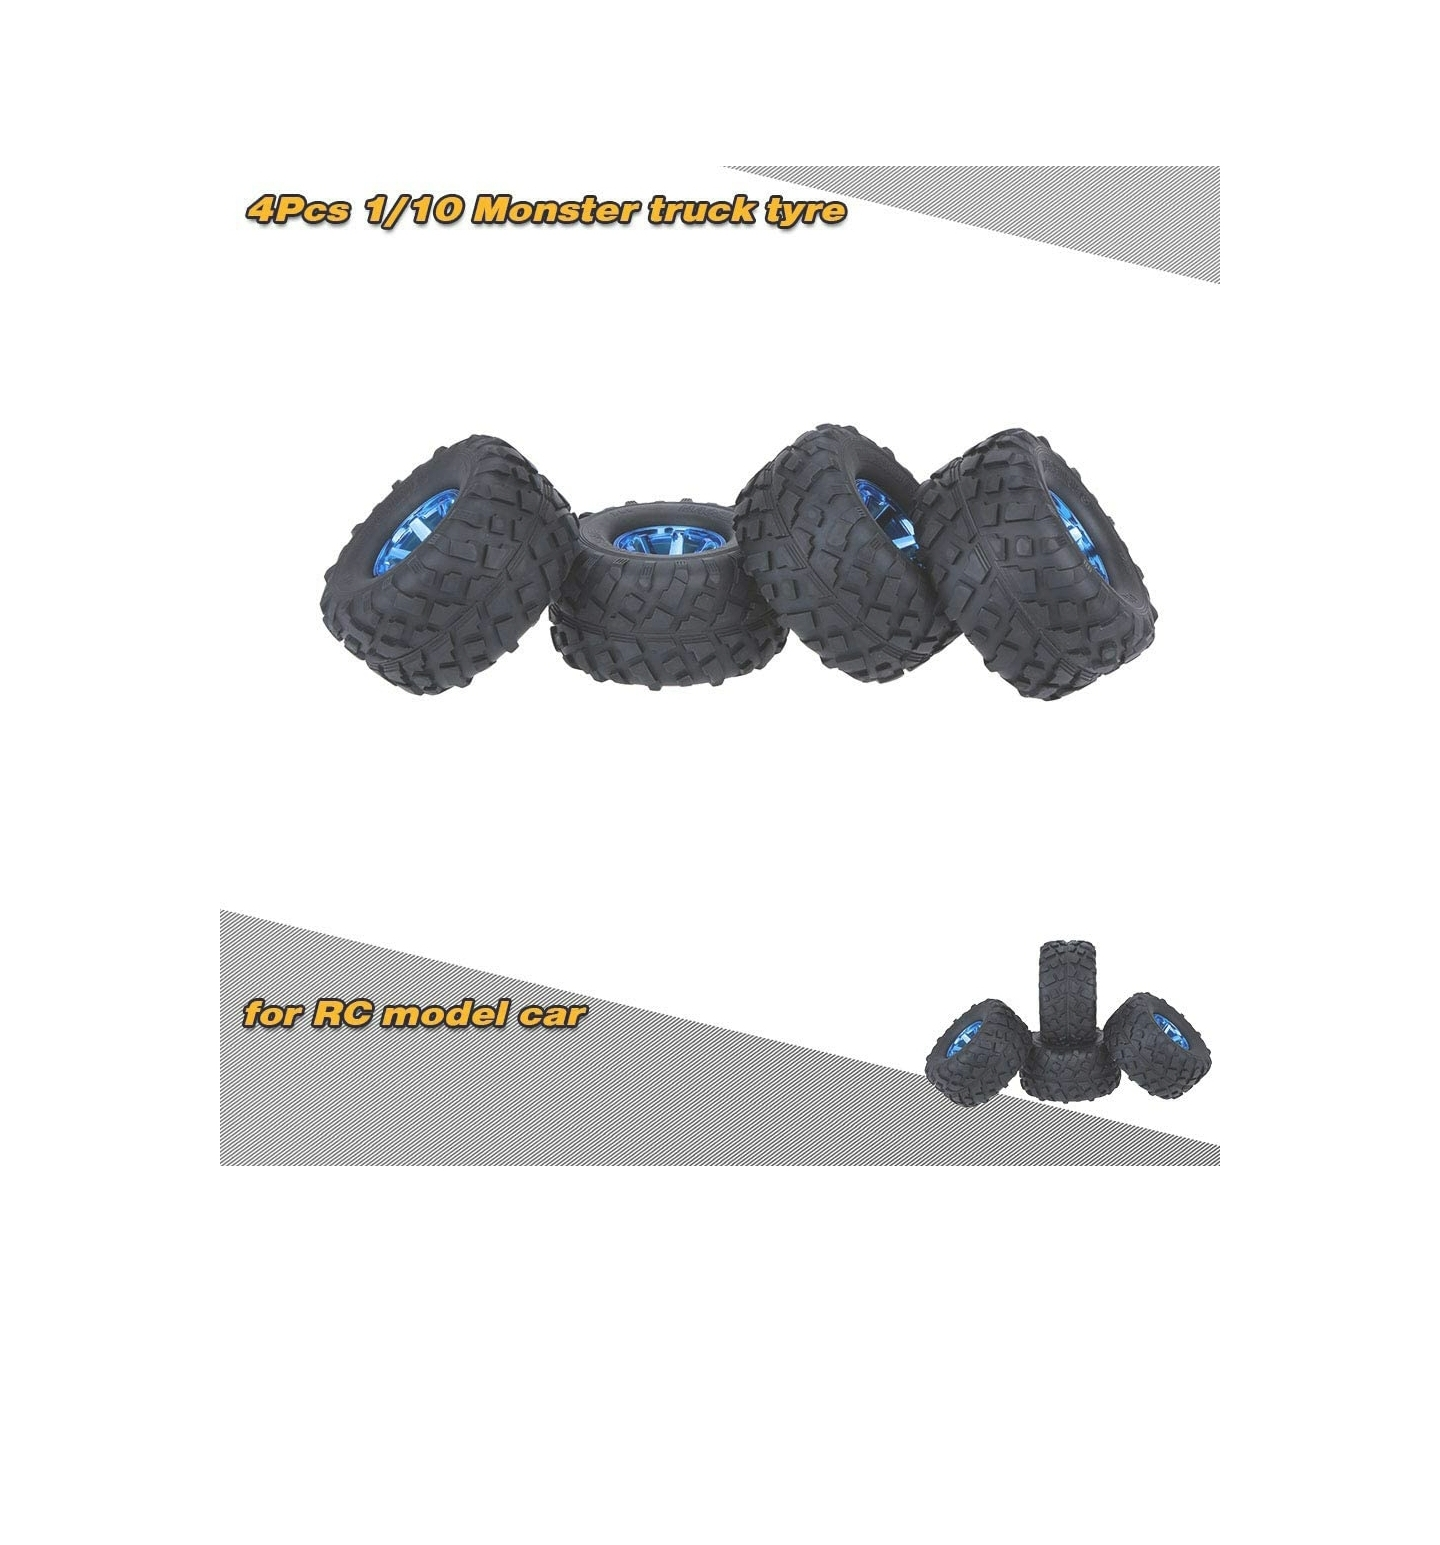 GoolRC 4PCS/Set 1/10 Monster Truck Tire Tyres for Traxxas, HSP, Tamiya, HPI, Kyosho, RC Model Car